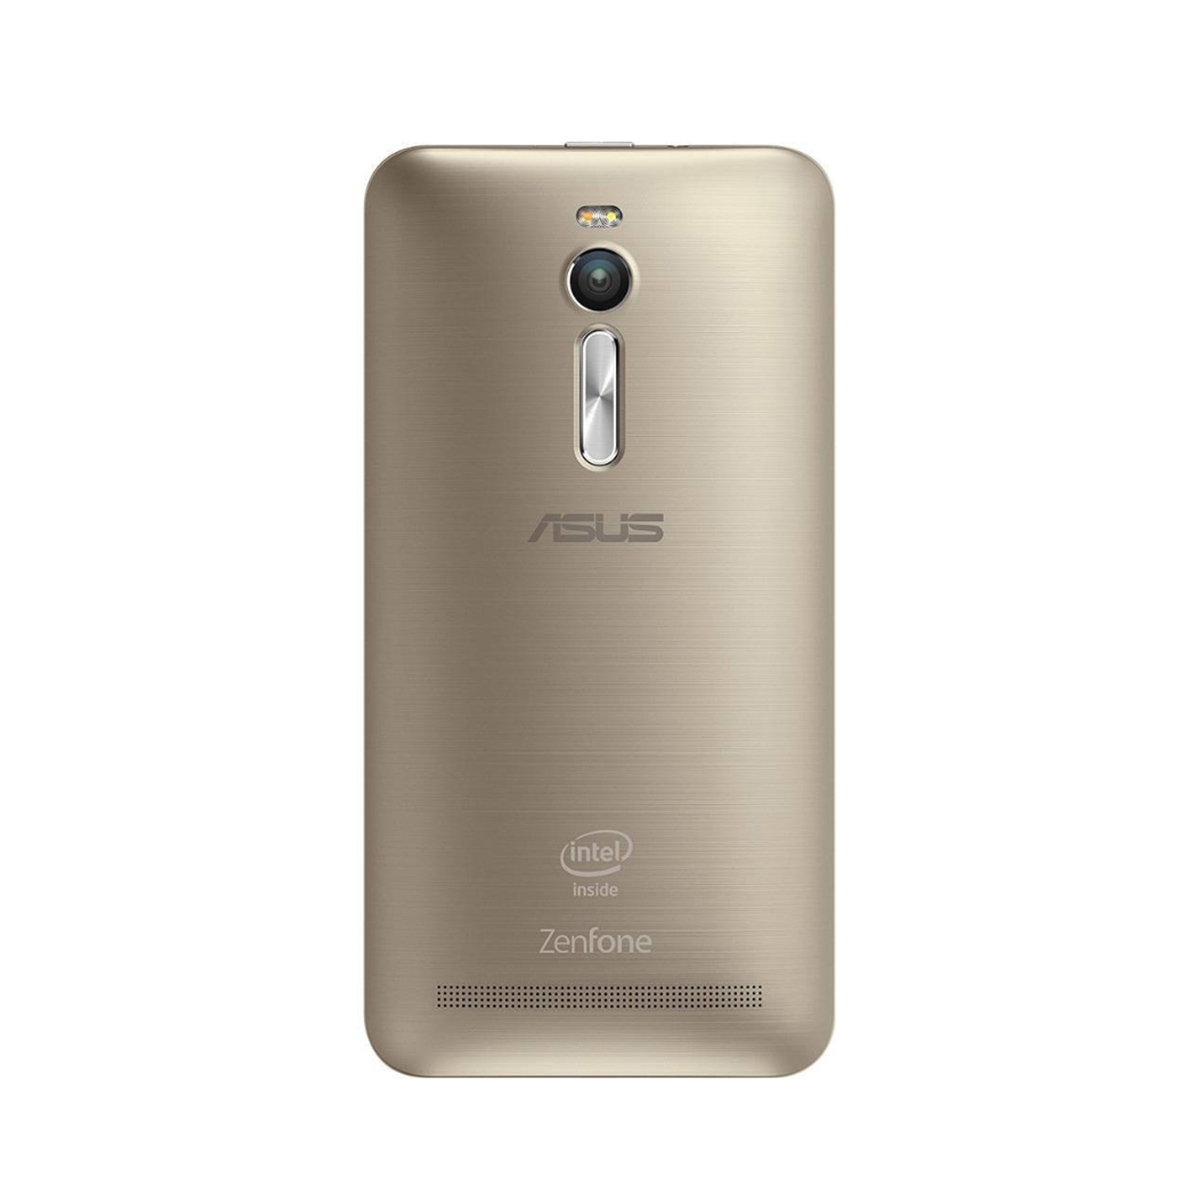 Asus Zenfone 2 32gb ZE551 Tela 5.5' Dual 4g - Seminovo